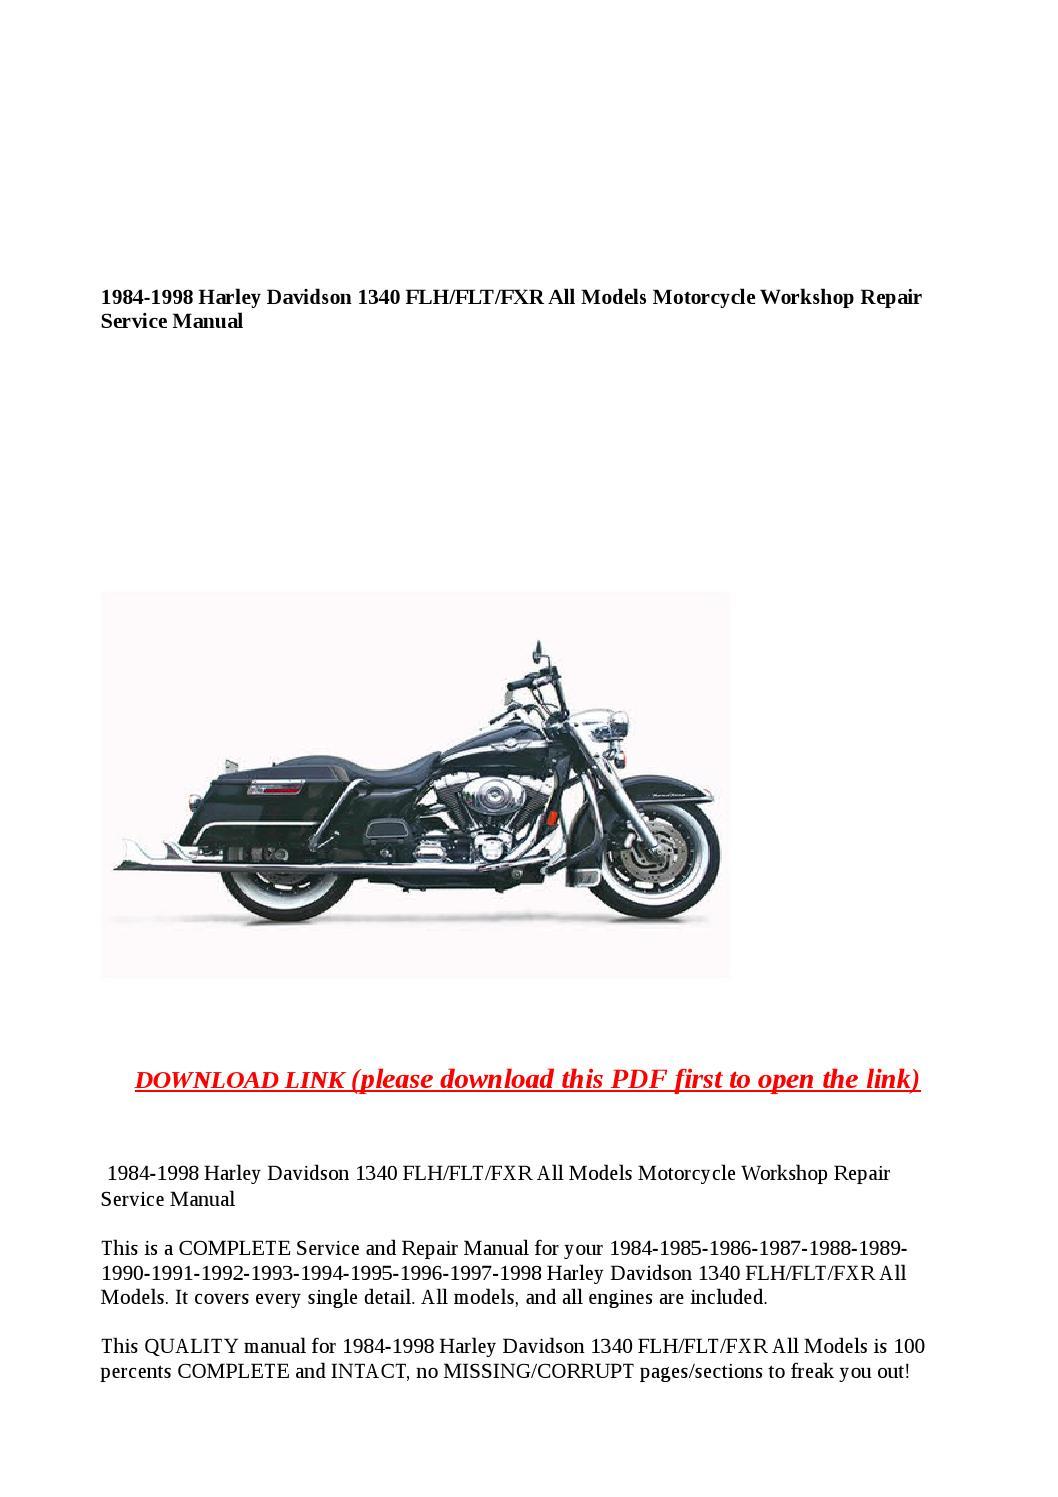 Harley Flht Wiring Diagram